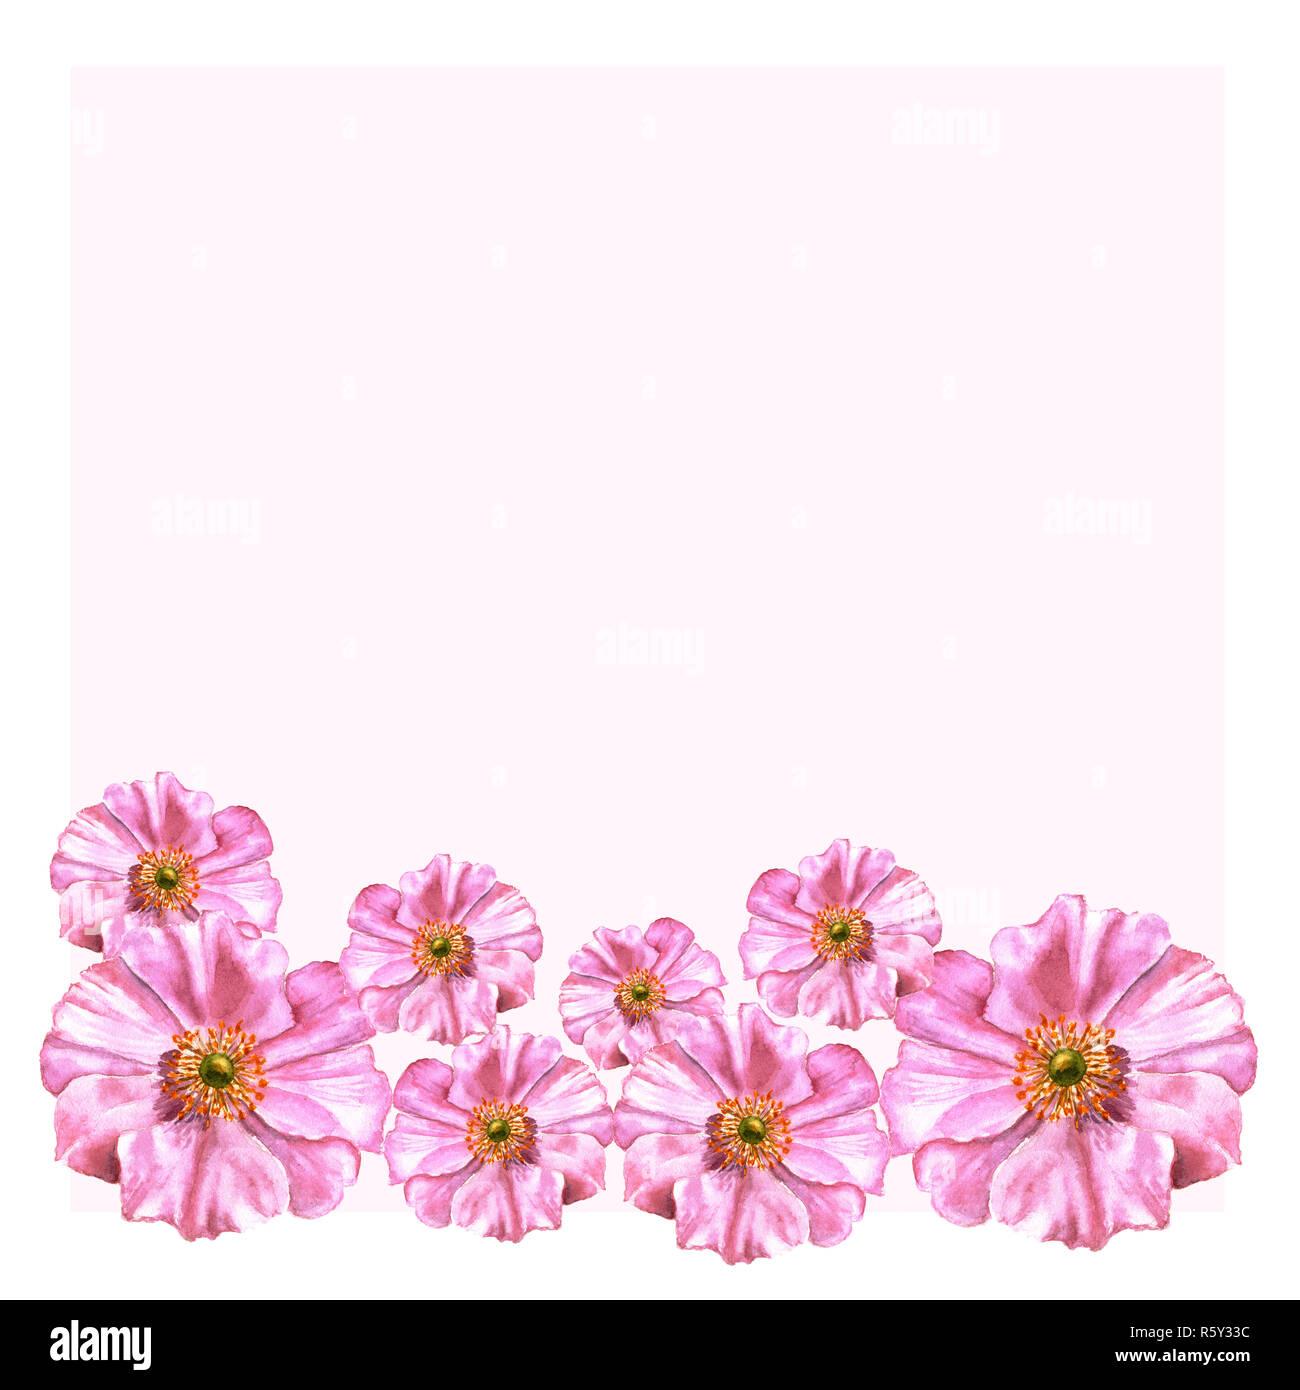 Flores Acuarela Pintada A Mano En Estilo Vintage Anémonas